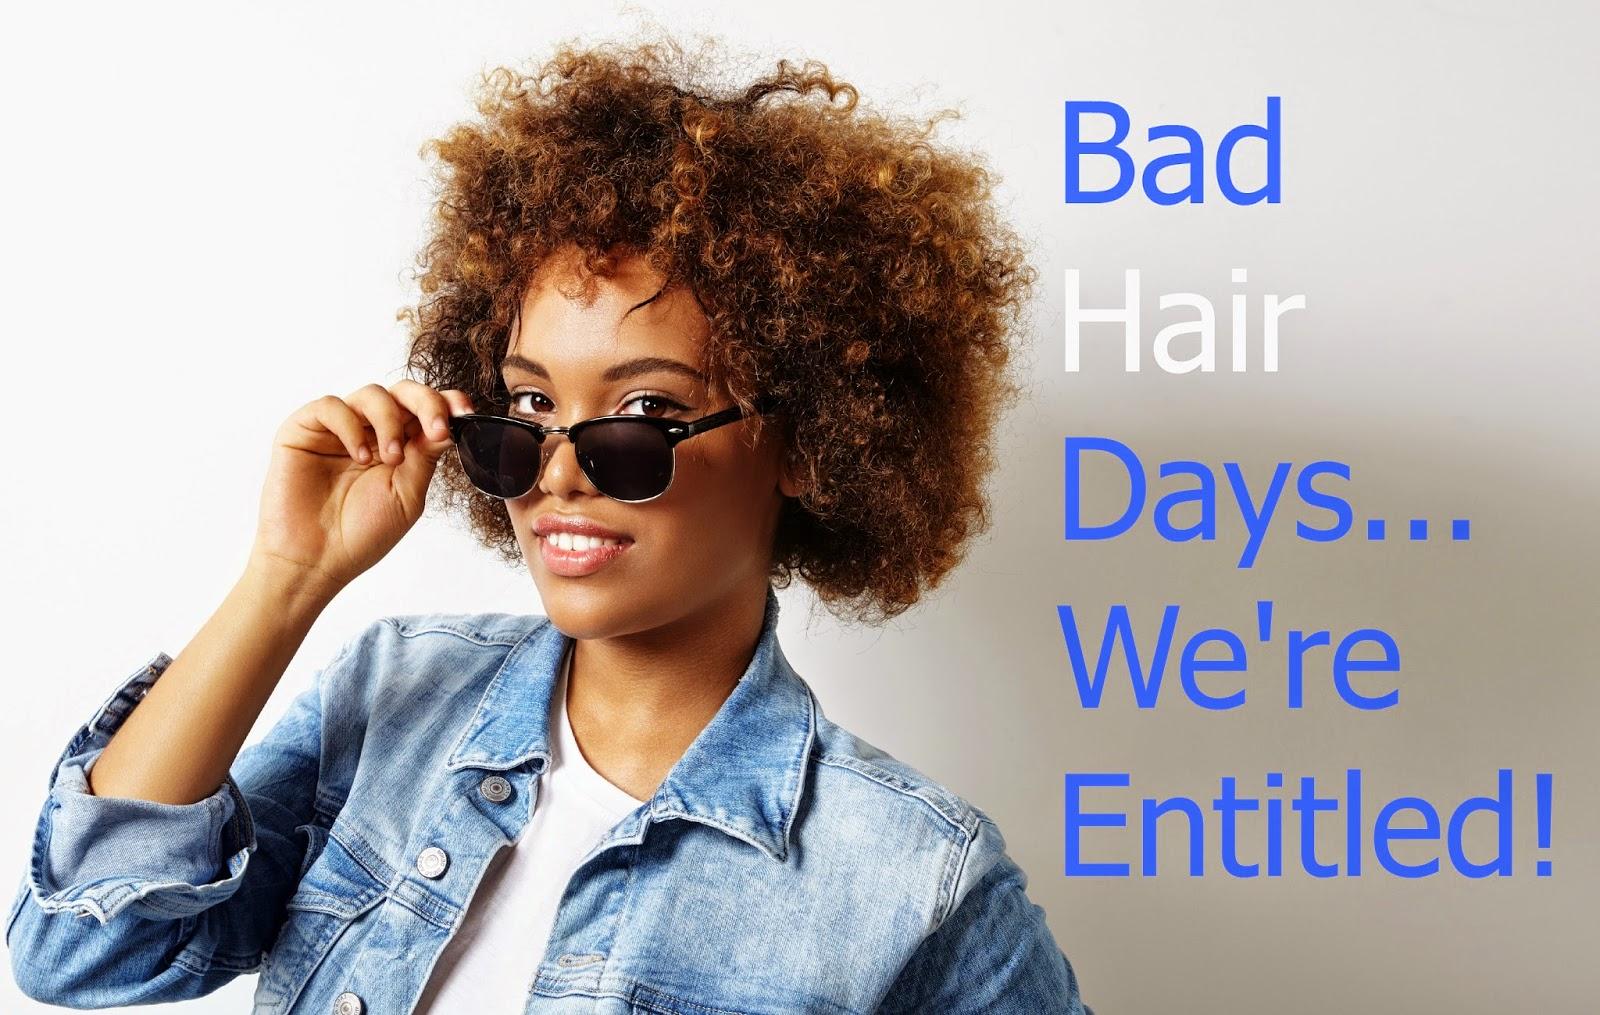 Bad Hair days...we're entitled!